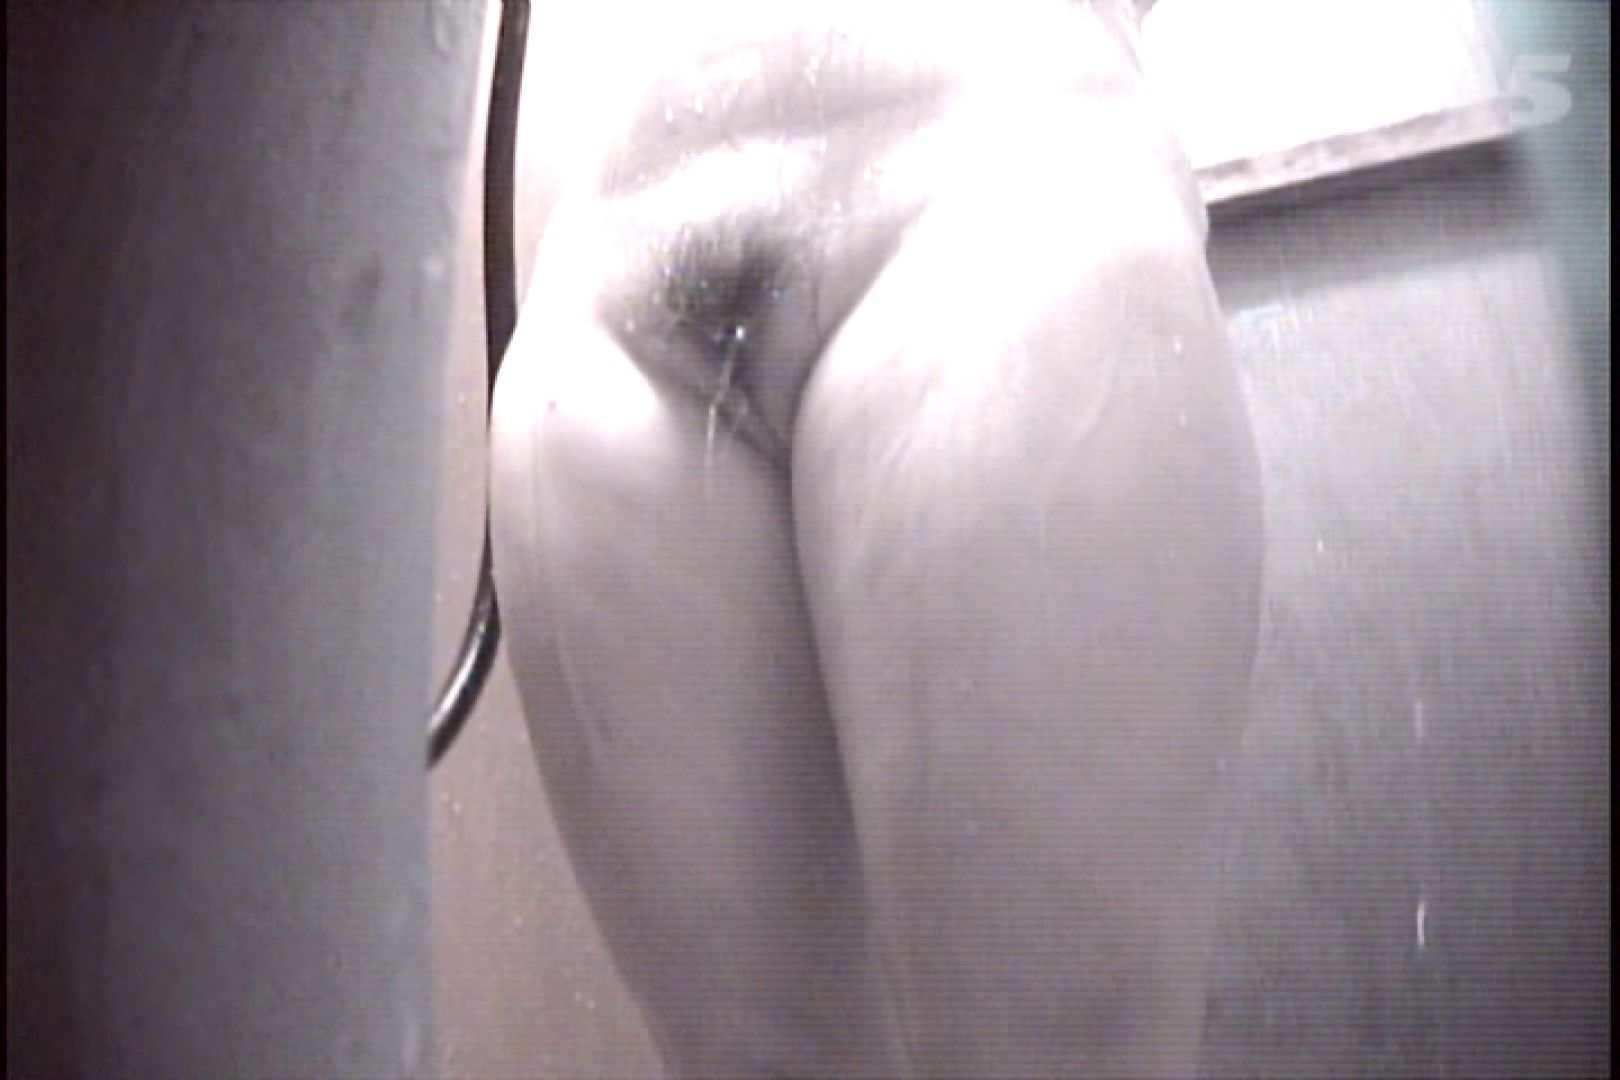 File.35 下からくっきりワレメちゃん確認! シャワー室 AV動画キャプチャ 39画像 29